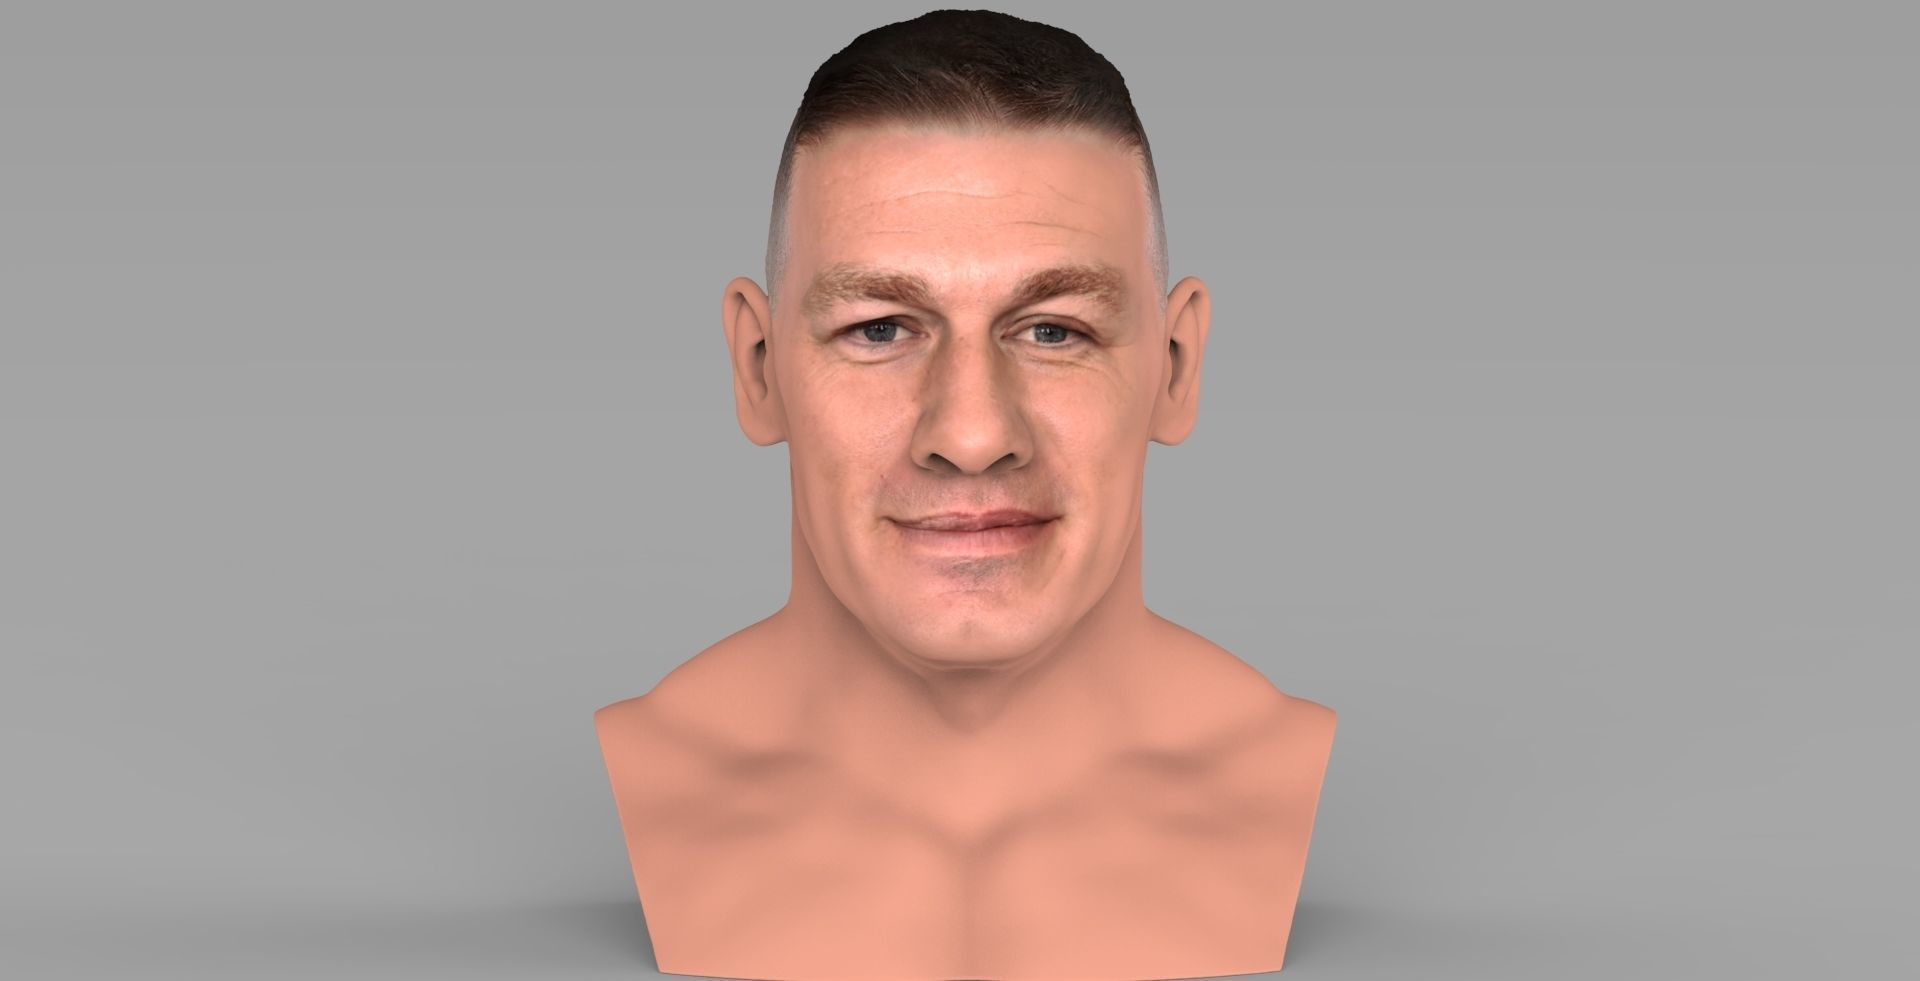 John Cena bust ready for full color 3D printing